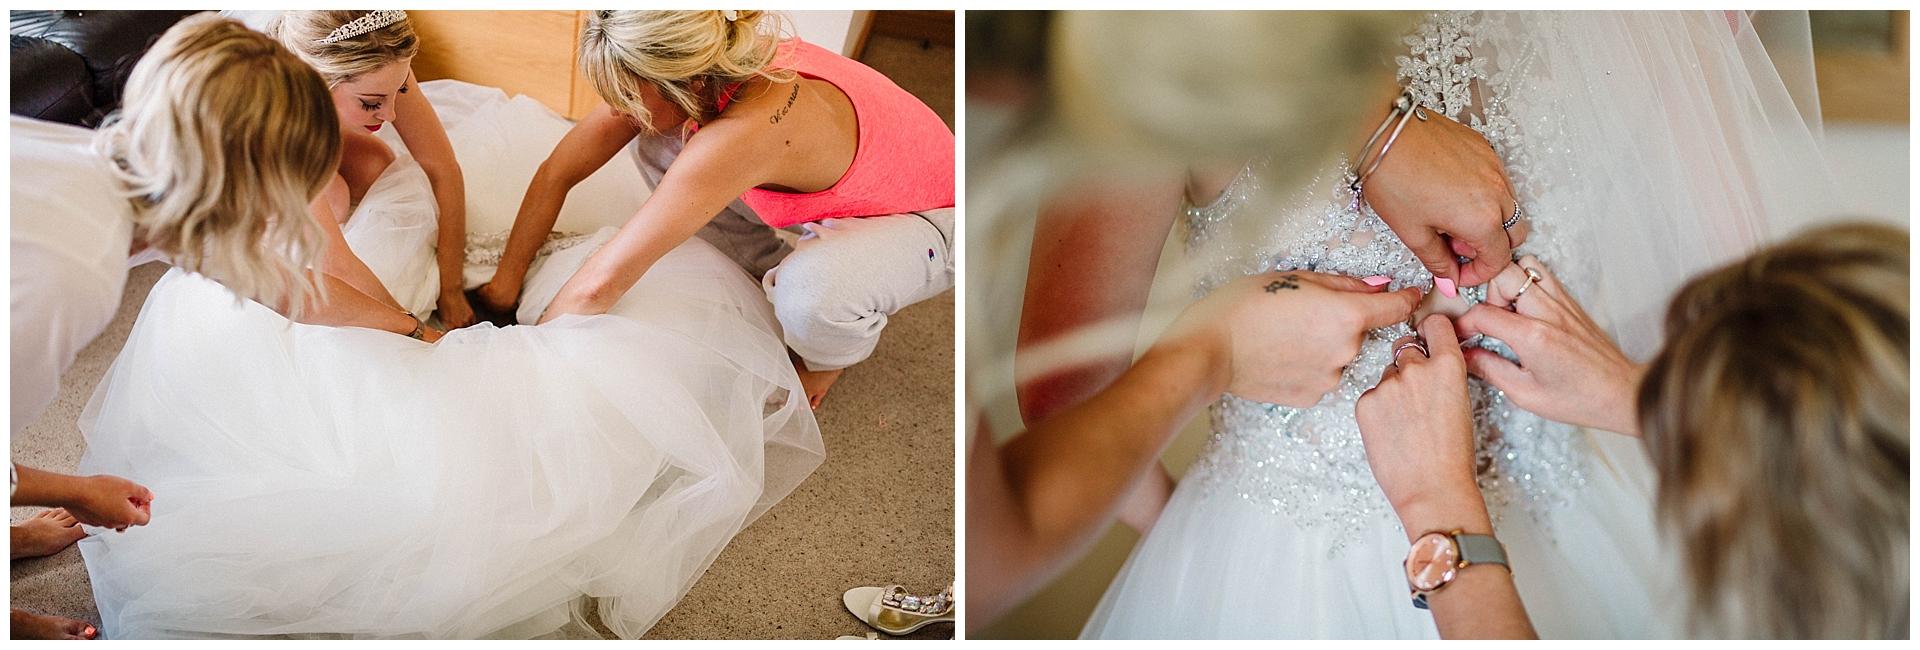 bride putting on her wedding dress at a yorkshire wedding.jpg